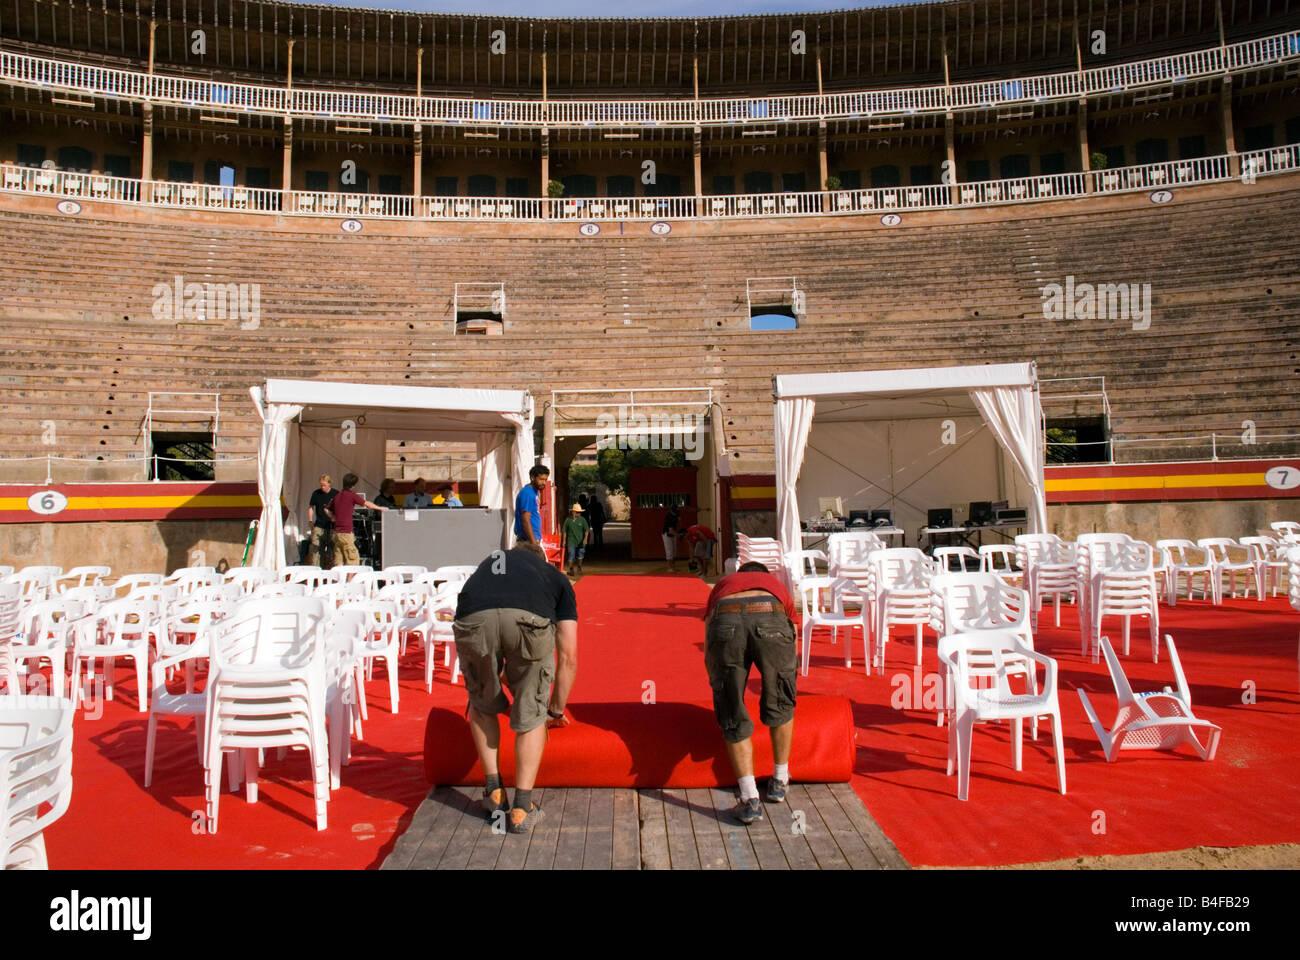 Bullring Palma Mallorca Spain Preparations underway backstage for a production of Carmina Burana Monumental Opera - Stock Image